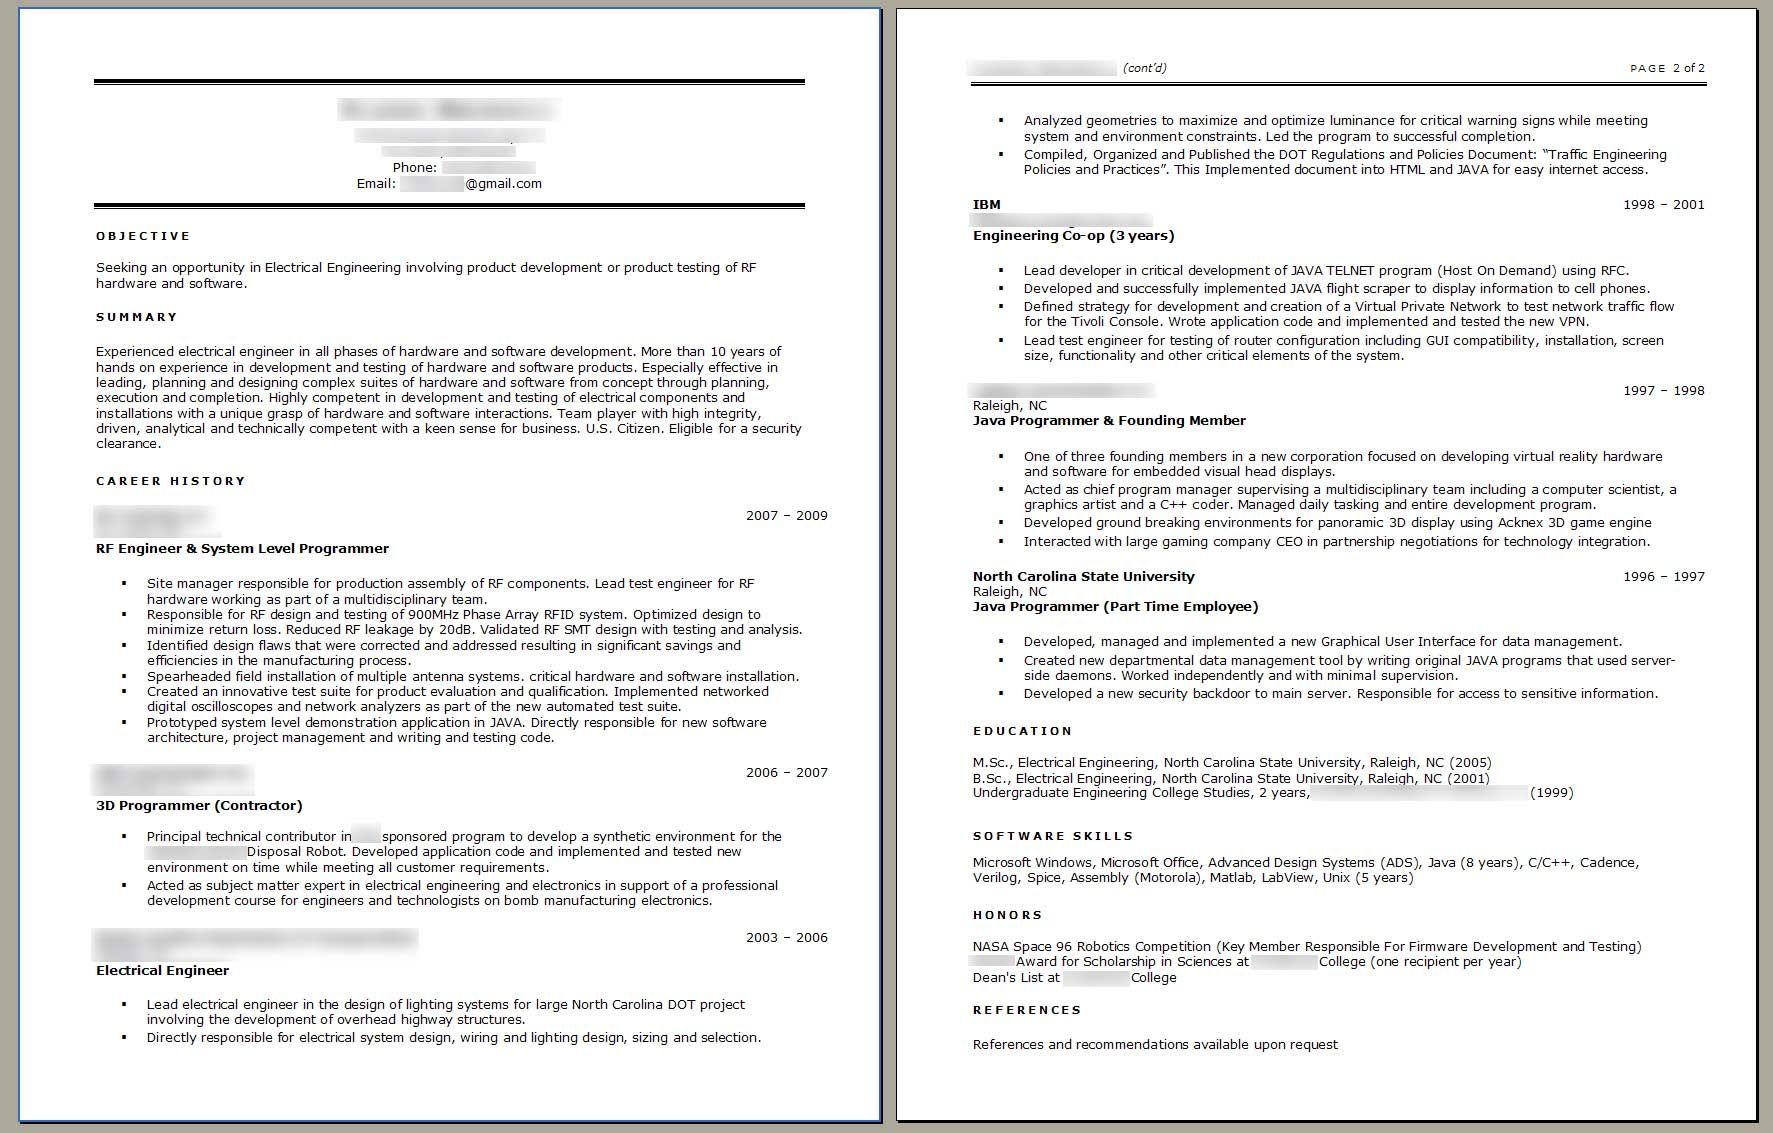 Standard Resume Format In Singapore – Resume Format Singapore